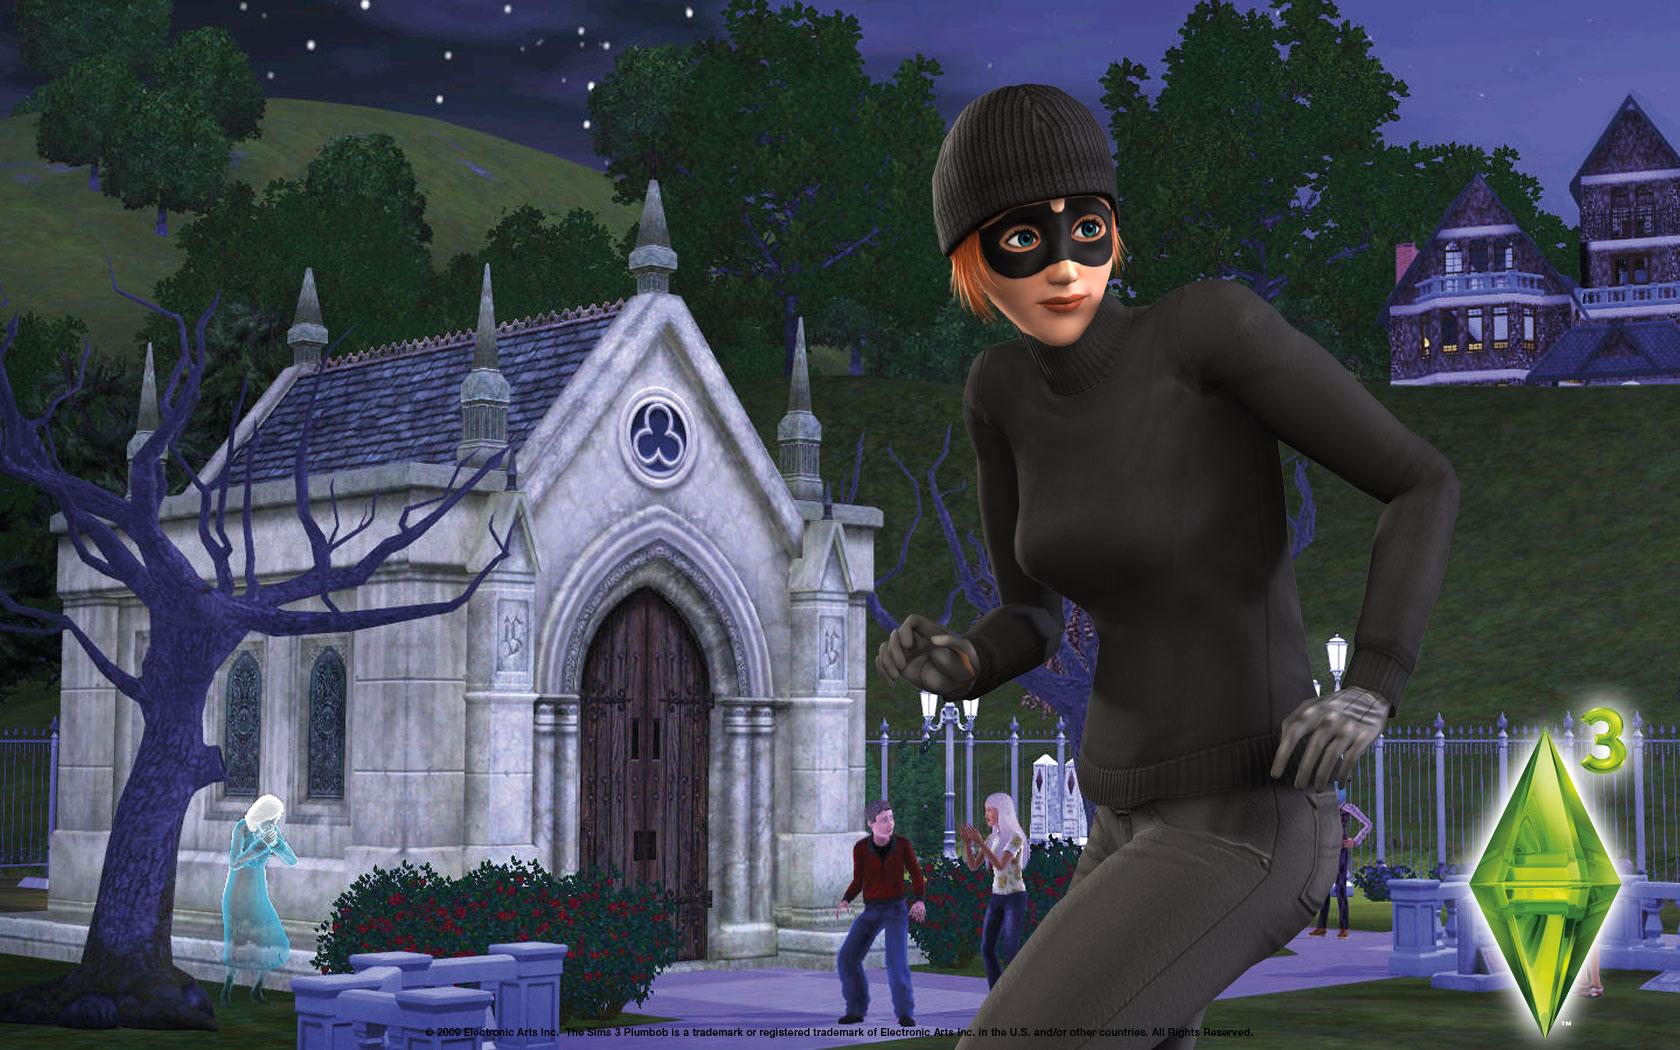 Sims 3 Wallpaper 4 16801050